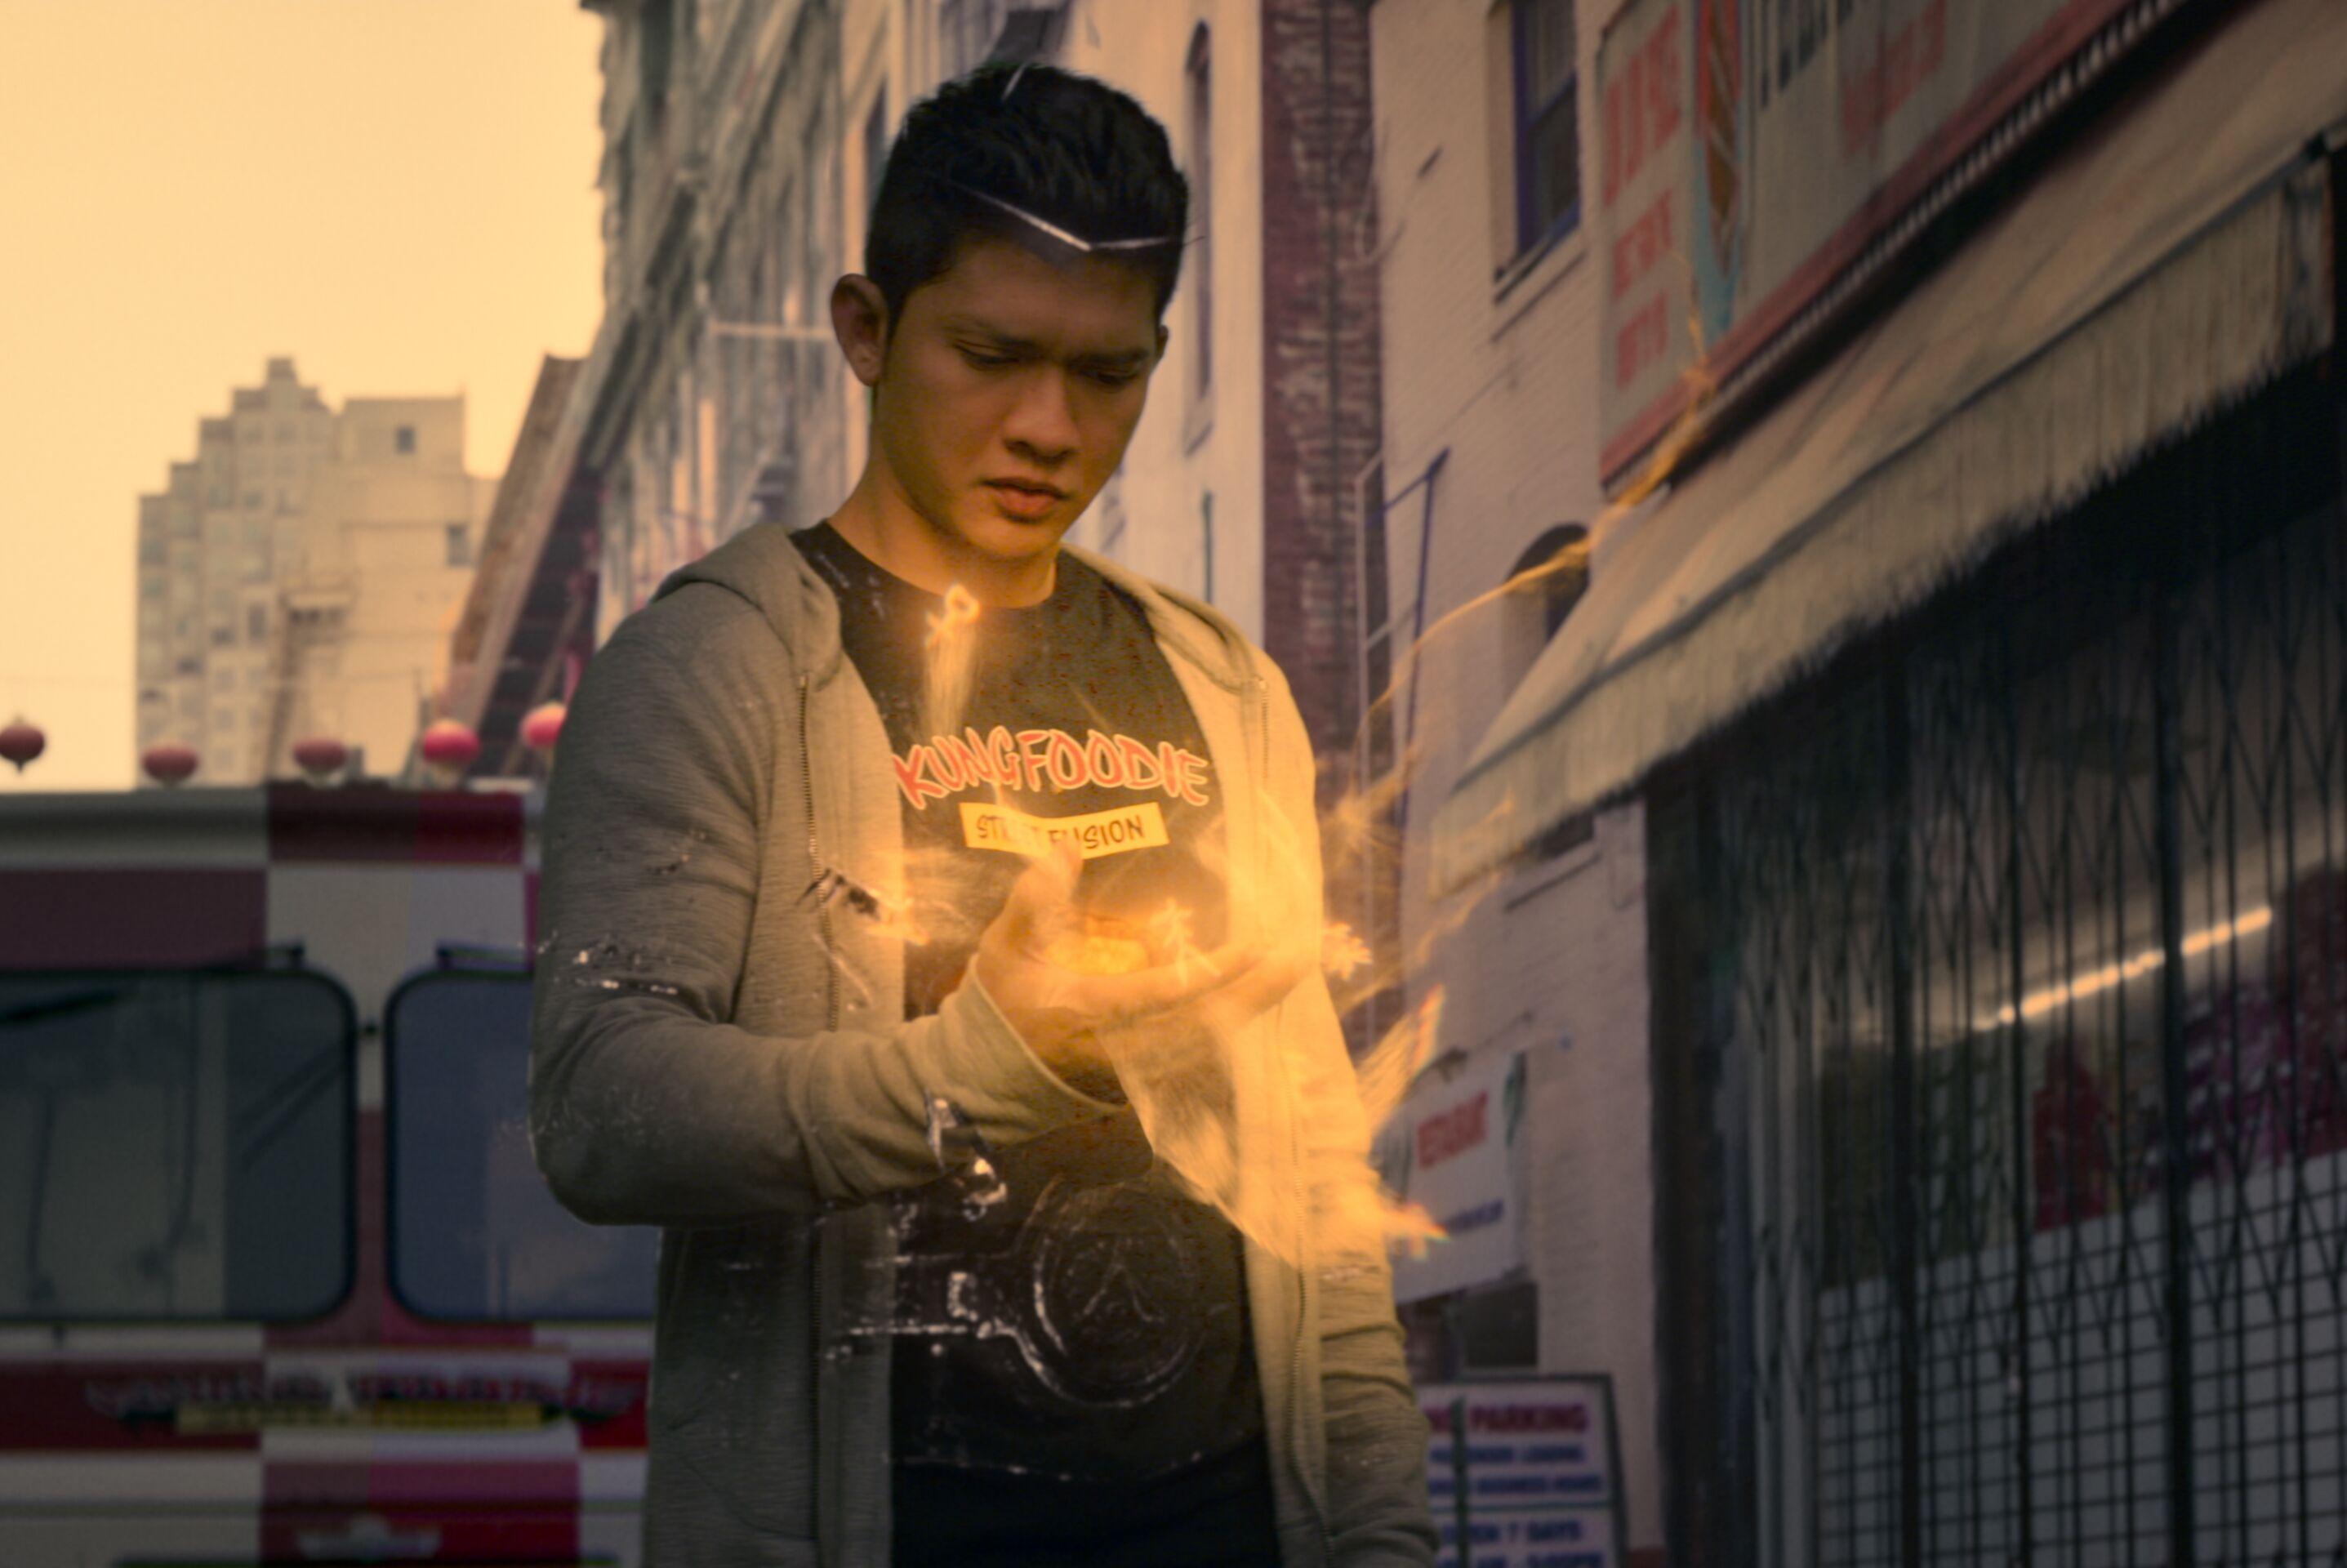 When will Wu Assassins season 2 be on Netflix?